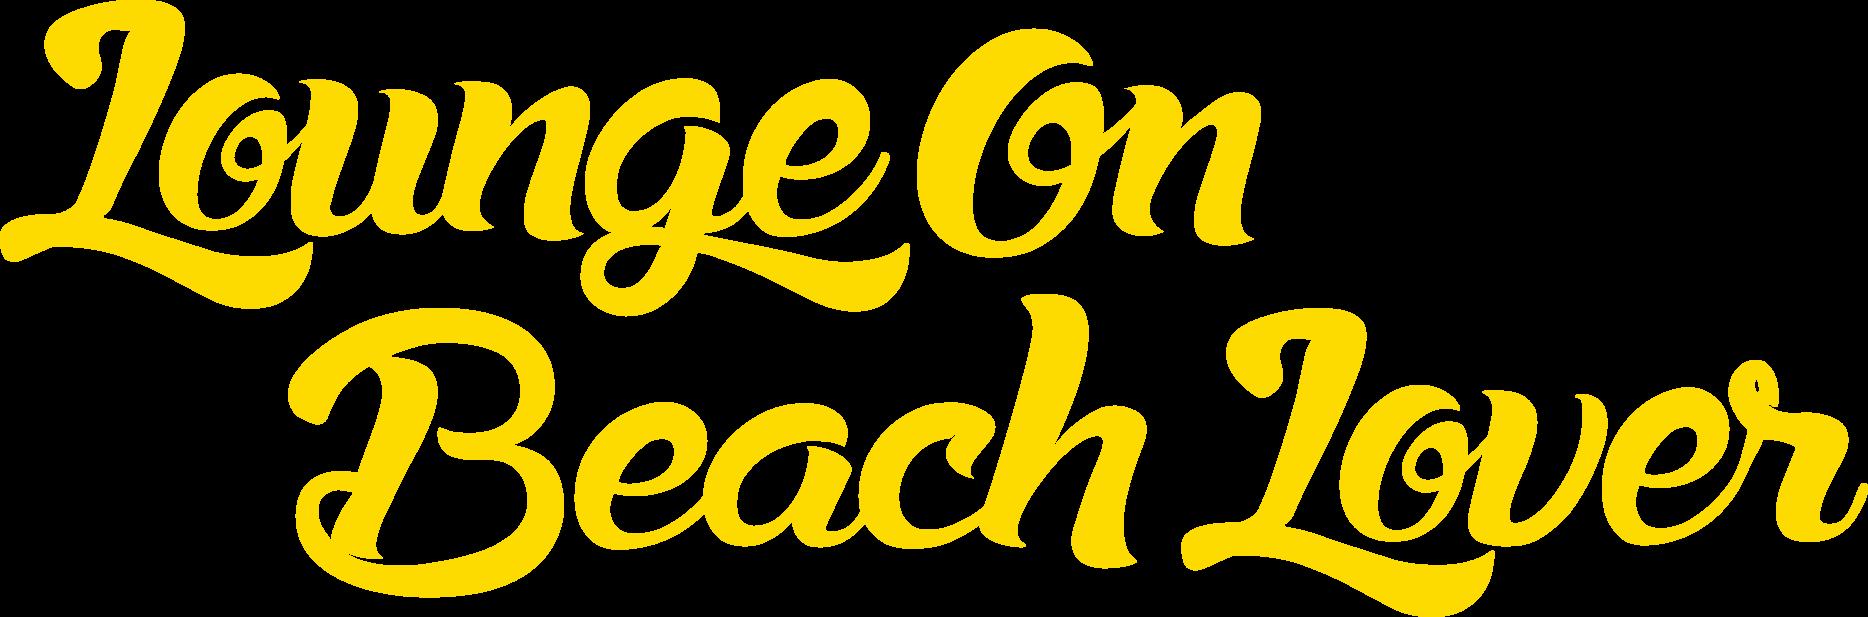 otb_loungeon_beach_lover_blk_cmyk1-yellow